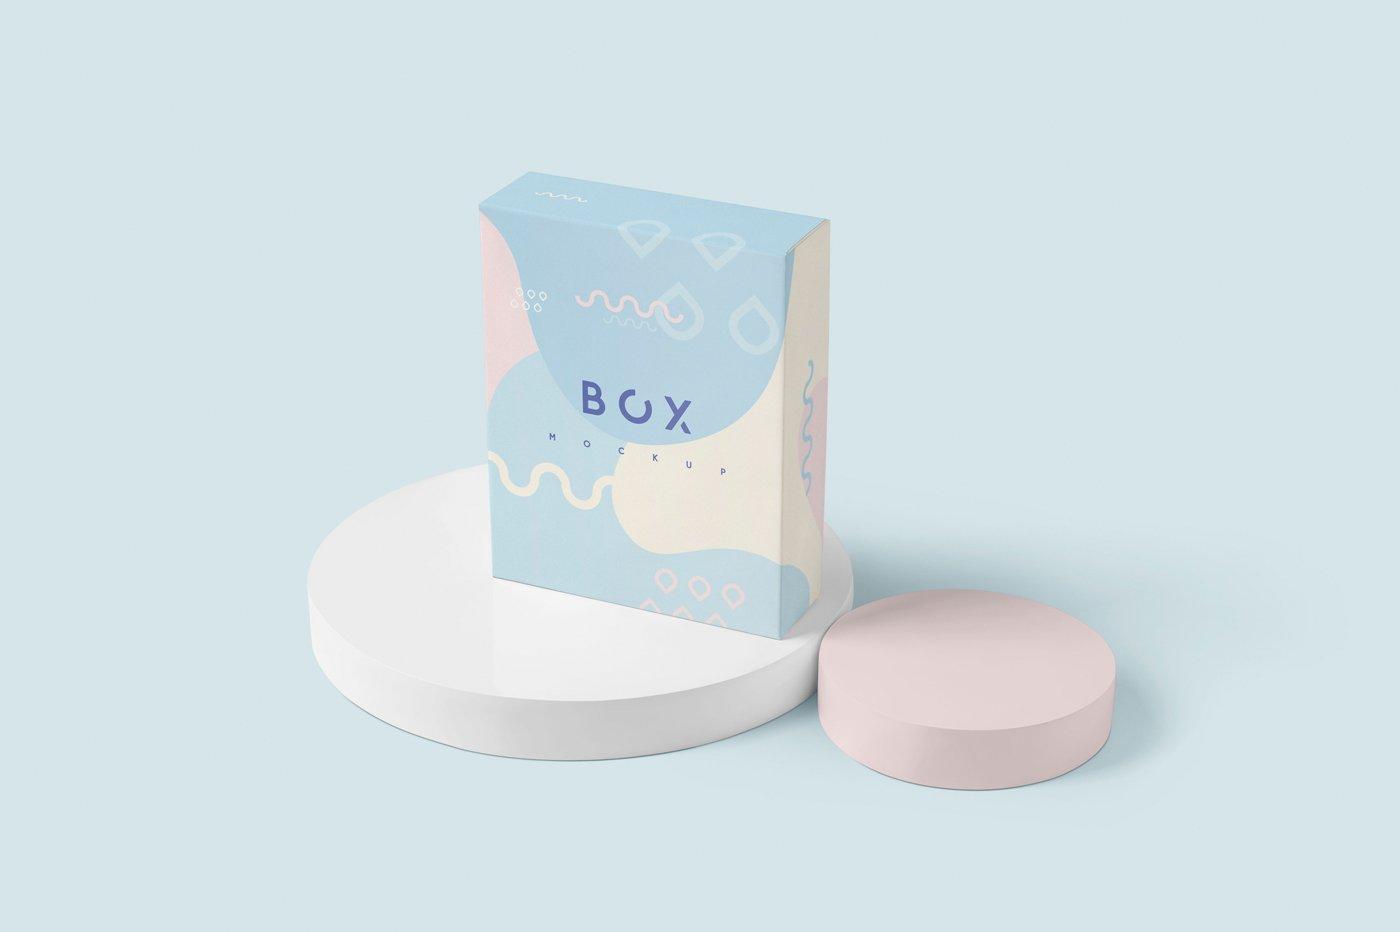 礼品包装纸盒设计展示样机模板 Slim Gift Packaging Box Mockups插图(4)